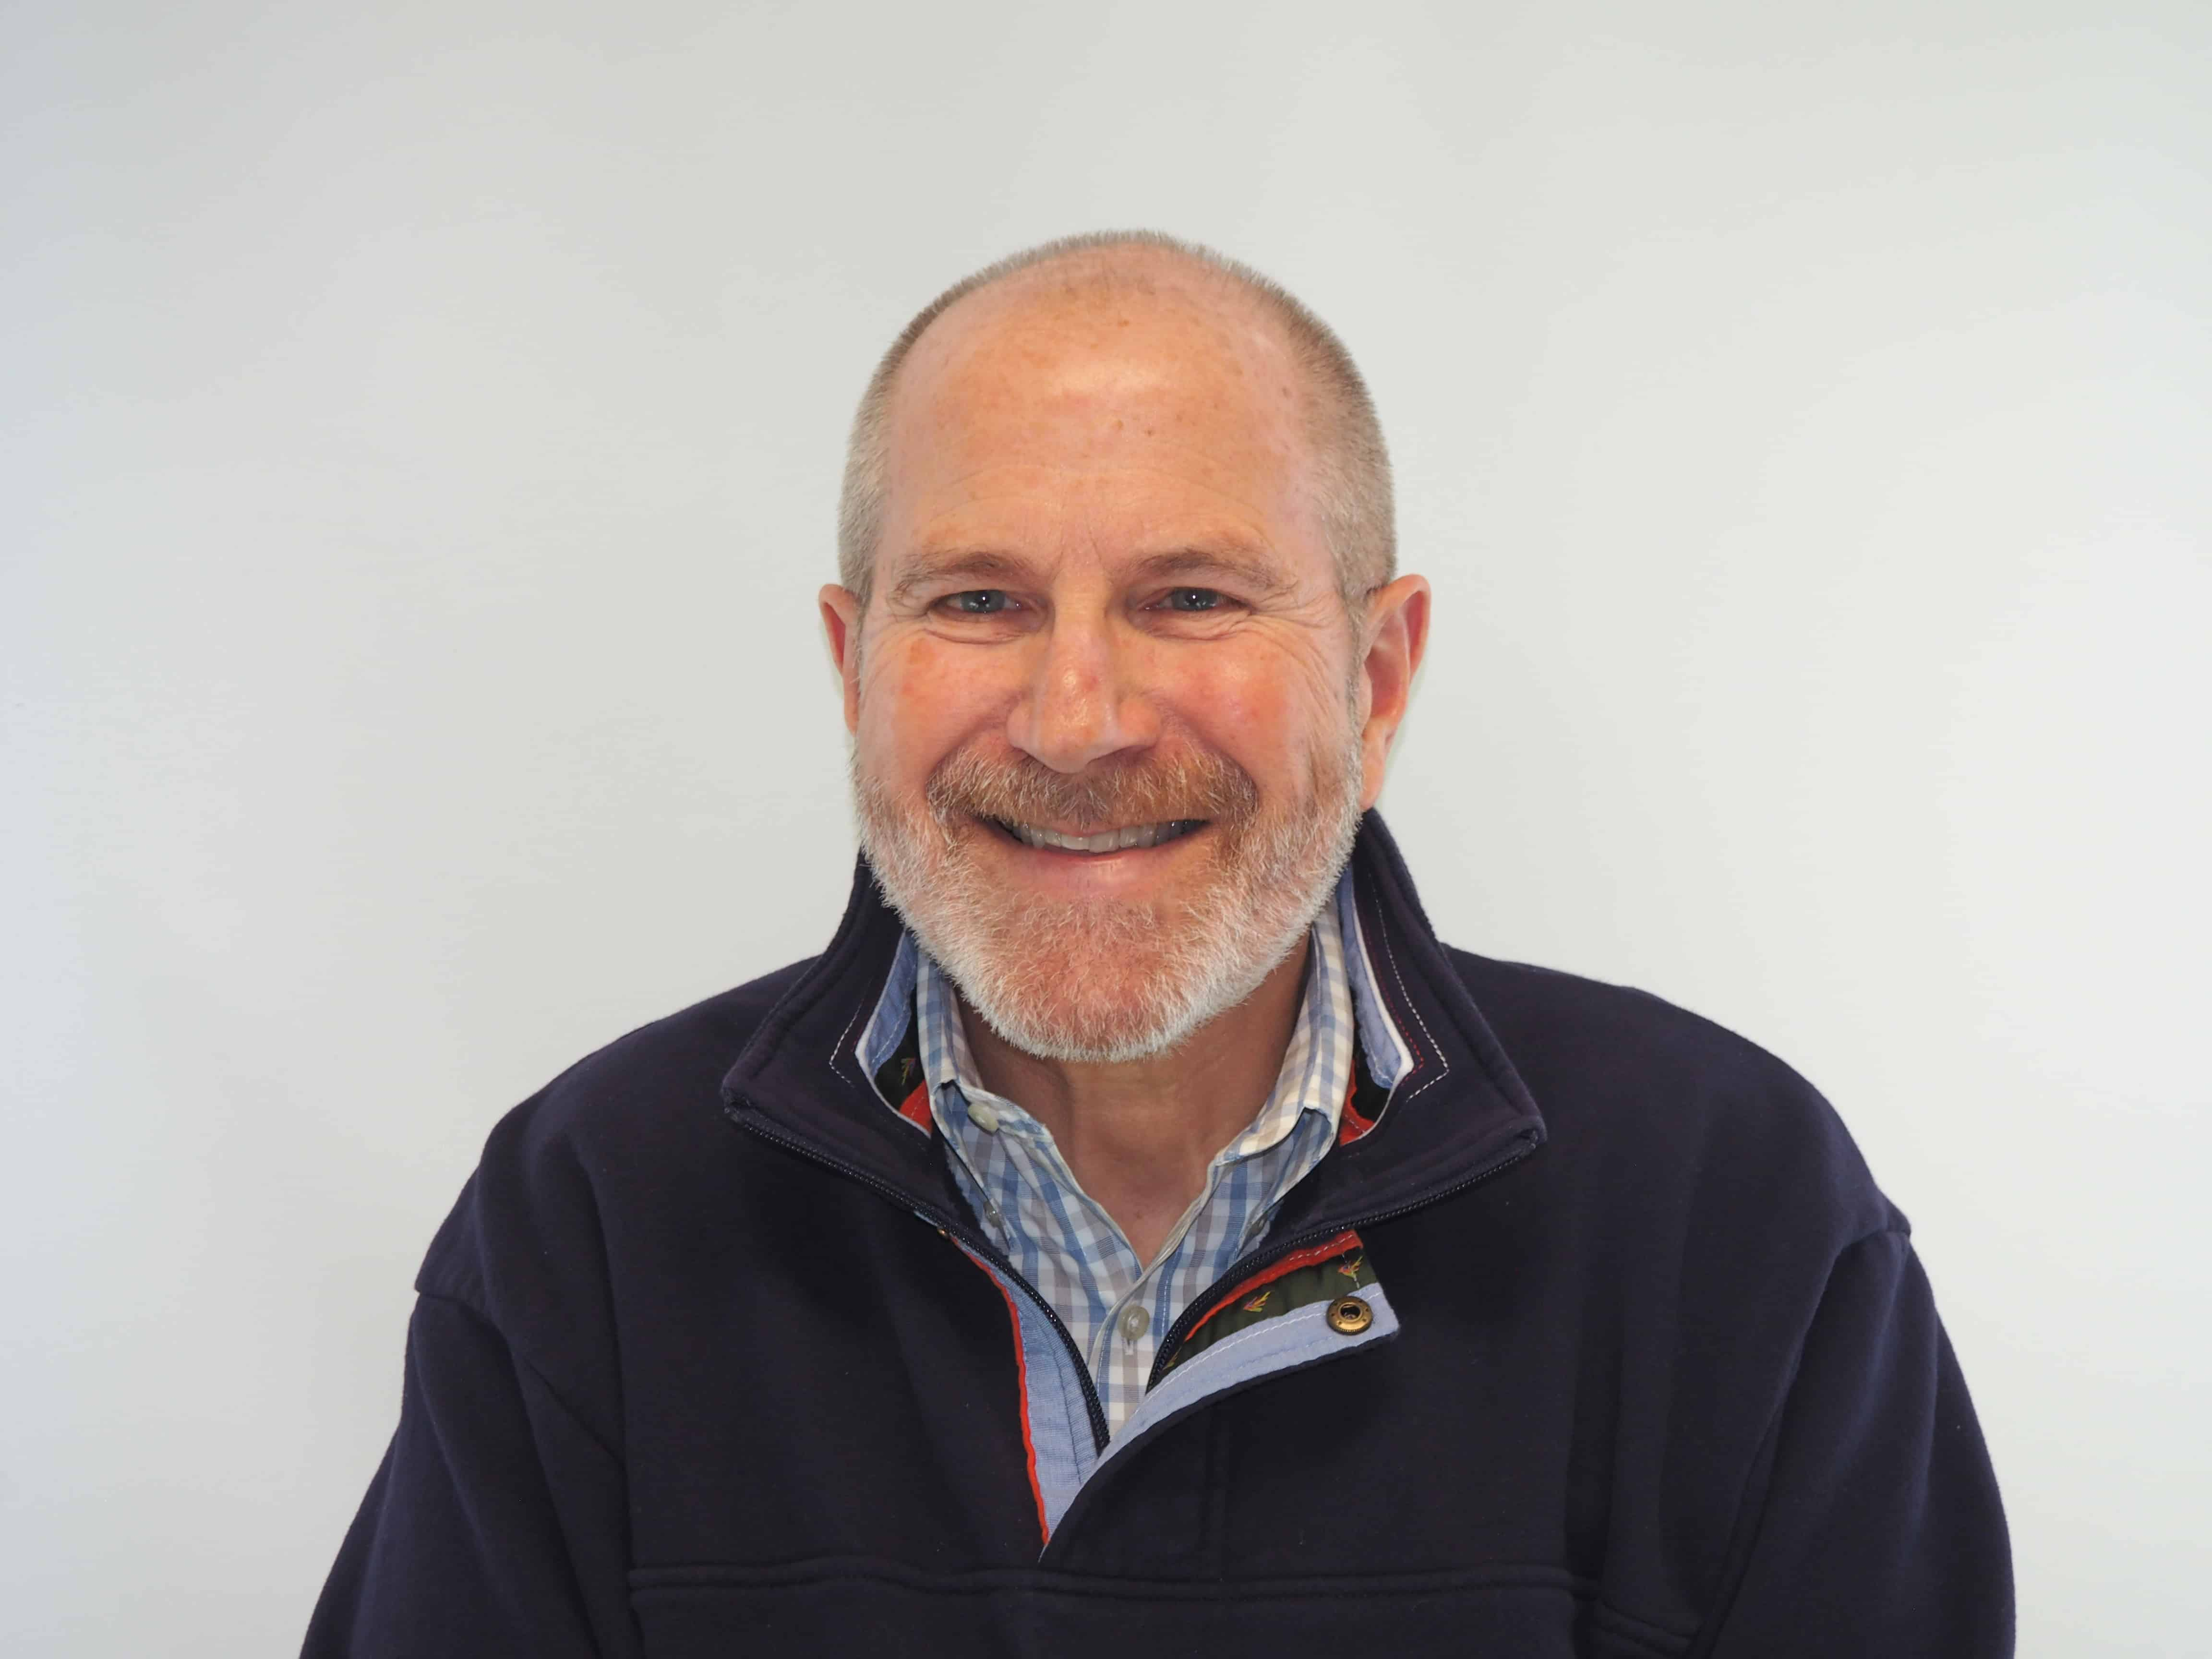 Brian Weiner, Vice President, Digital Solutions